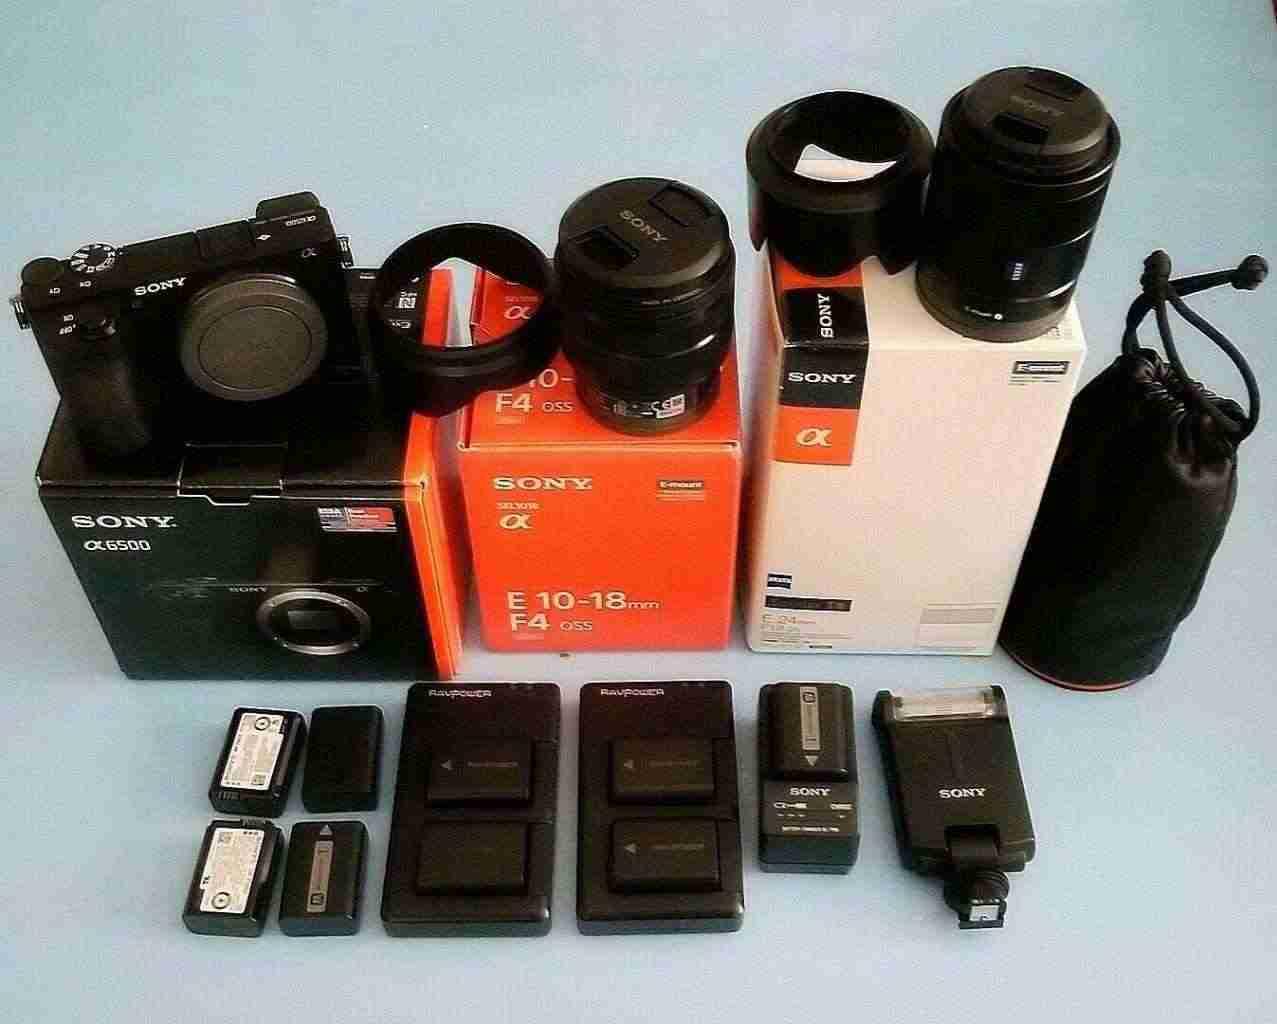 Sony A6500 2 lenti 1 flash 8 batterie